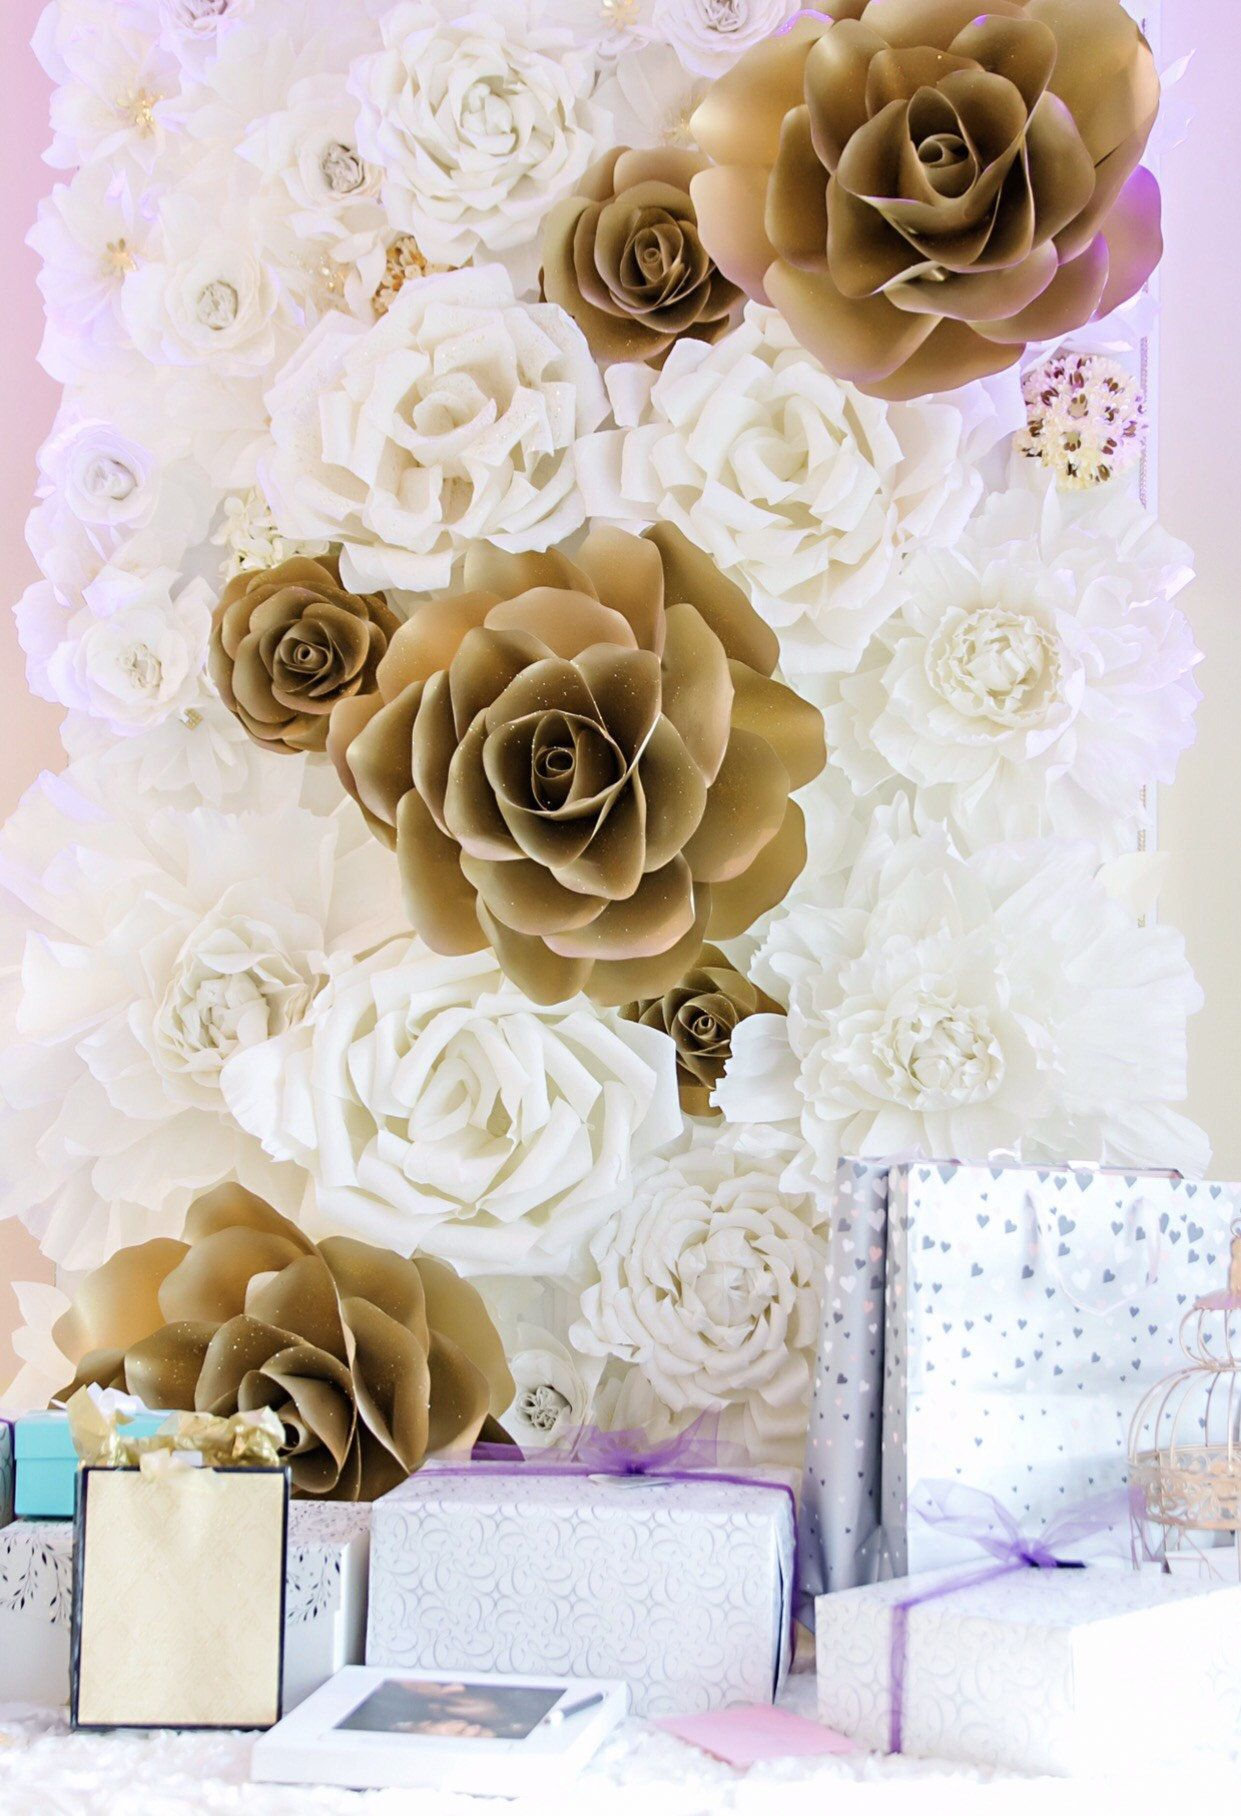 4x8 Paper Flower Backdrop Giant Paper Flowers Wall Paper Flower